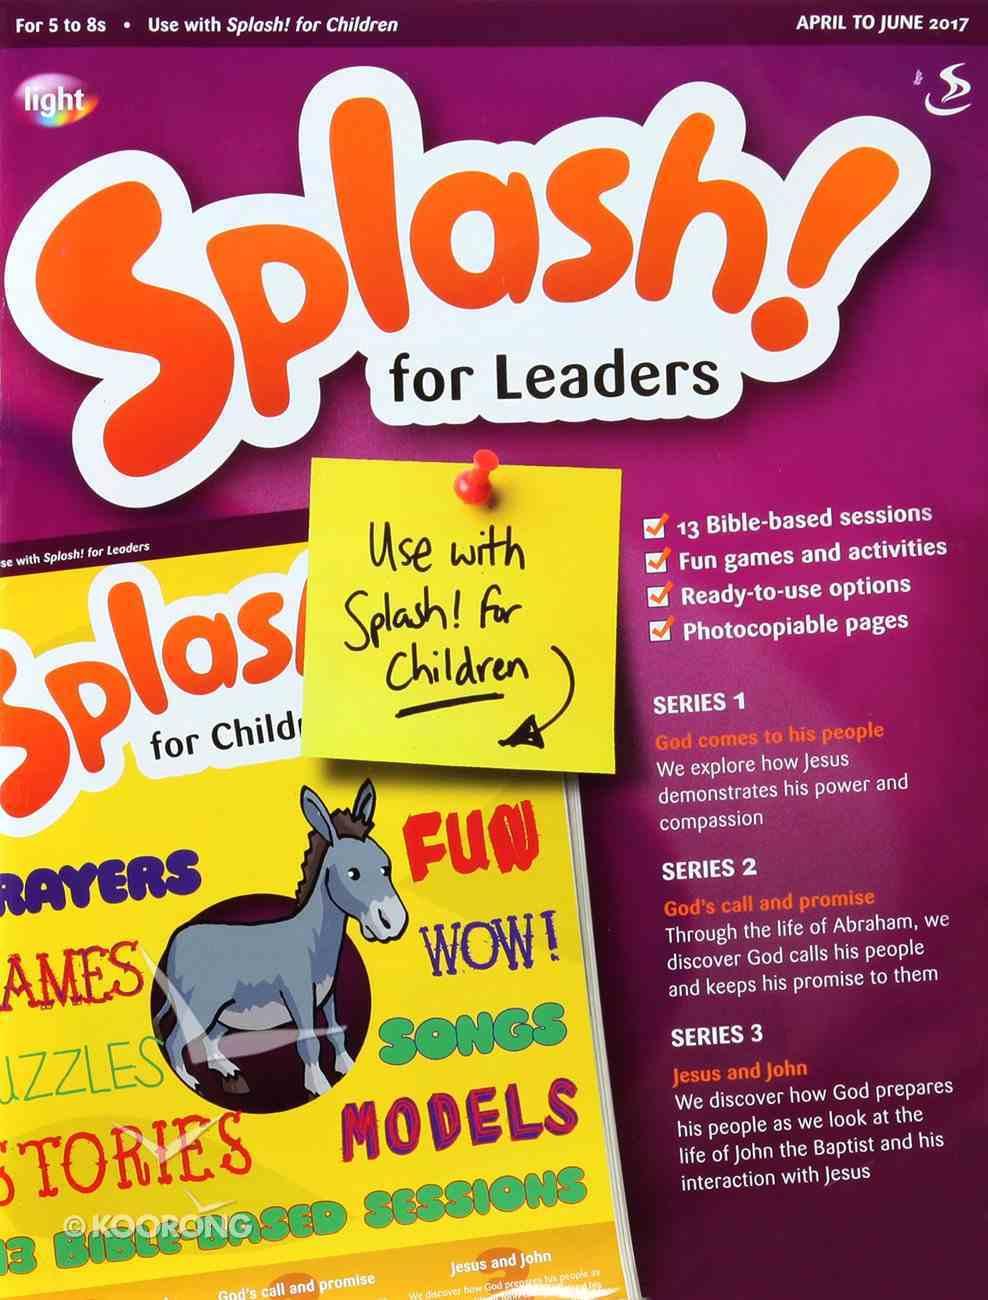 Light: Splash 2017 #02: Apr-Jun Teacher's Guide (5-8 Yrs) Paperback